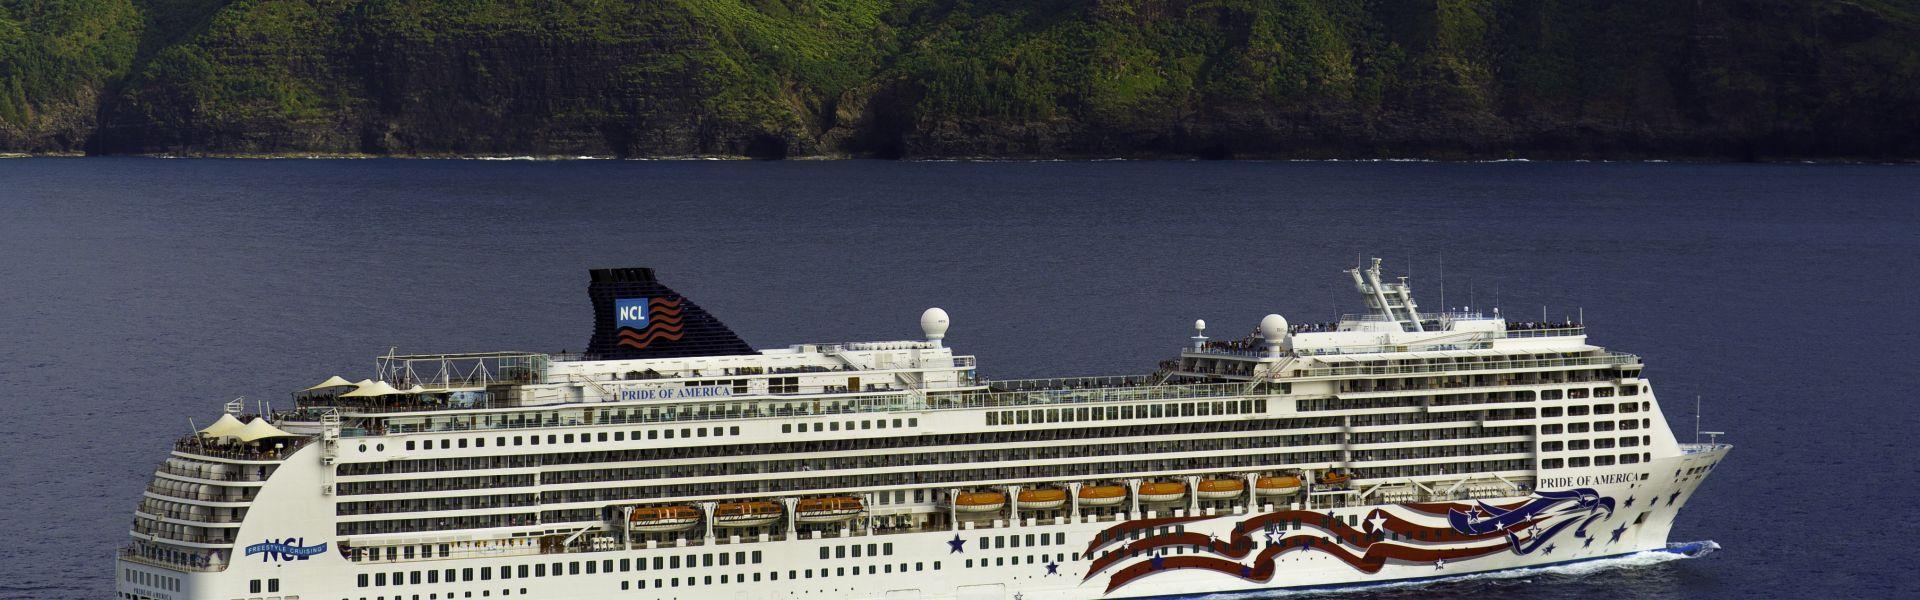 Croaziera Grup Organizat 2017 cu ZBOR INCLUS - Hawaii si Sejur SUA - Norwegian Cruise Line - Pride of America - 15 nopti - 25 August